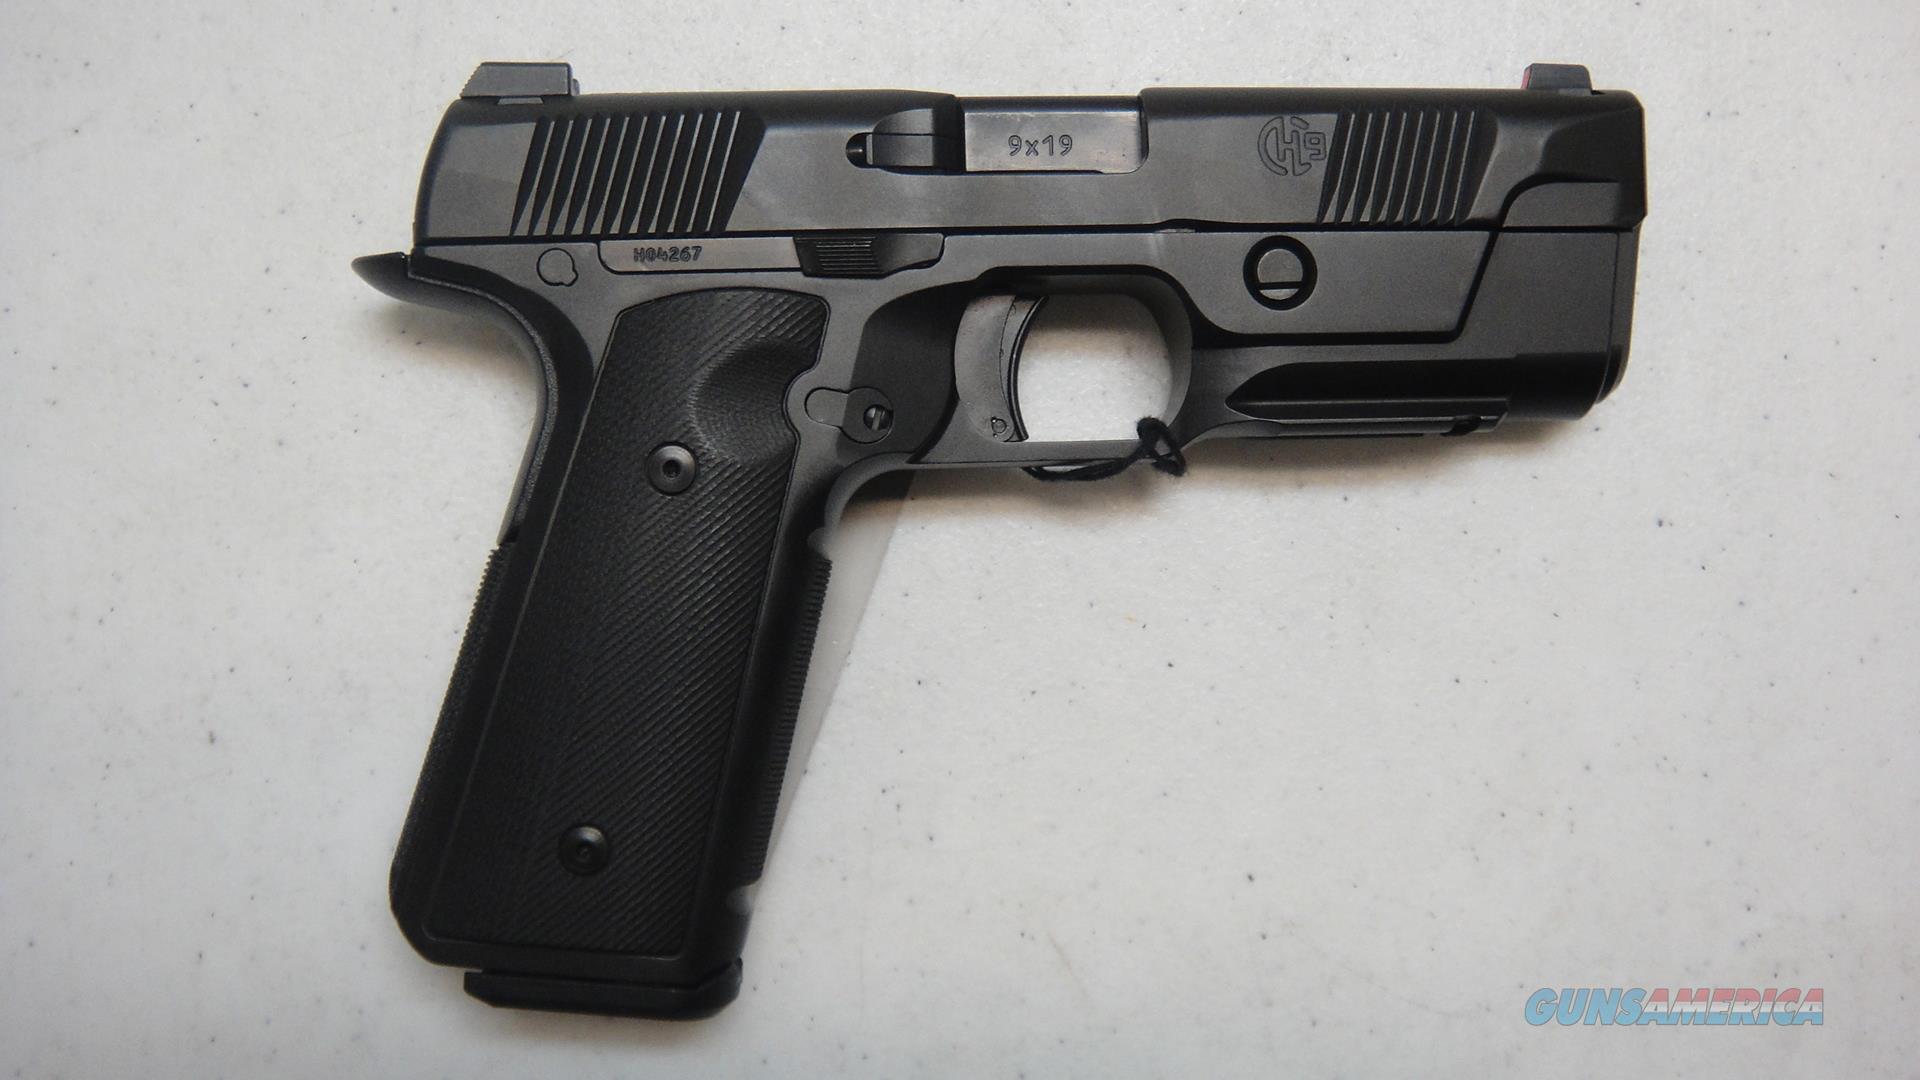 Hudson H9 w/ front night sight.  Guns > Pistols > Hudson Pistols